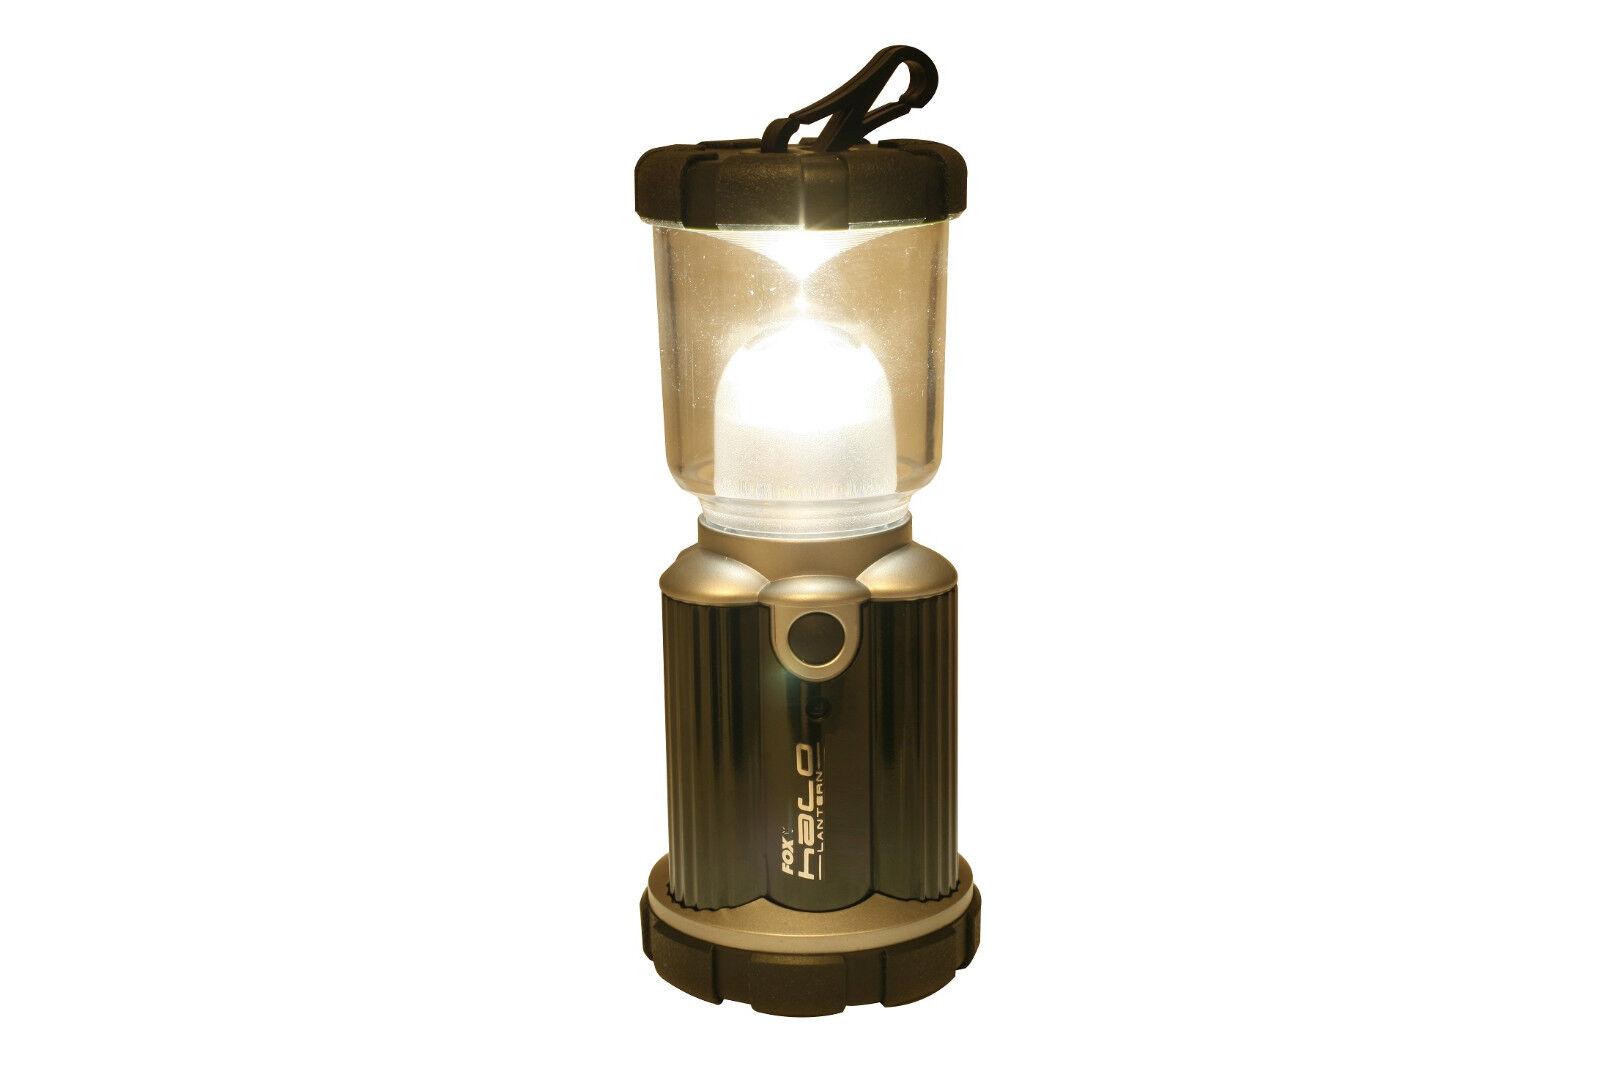 FOX Halo LT-136 Lantern CEI023 Lampe Zeltlampe Lamp Licht Zeltlicht Laterne